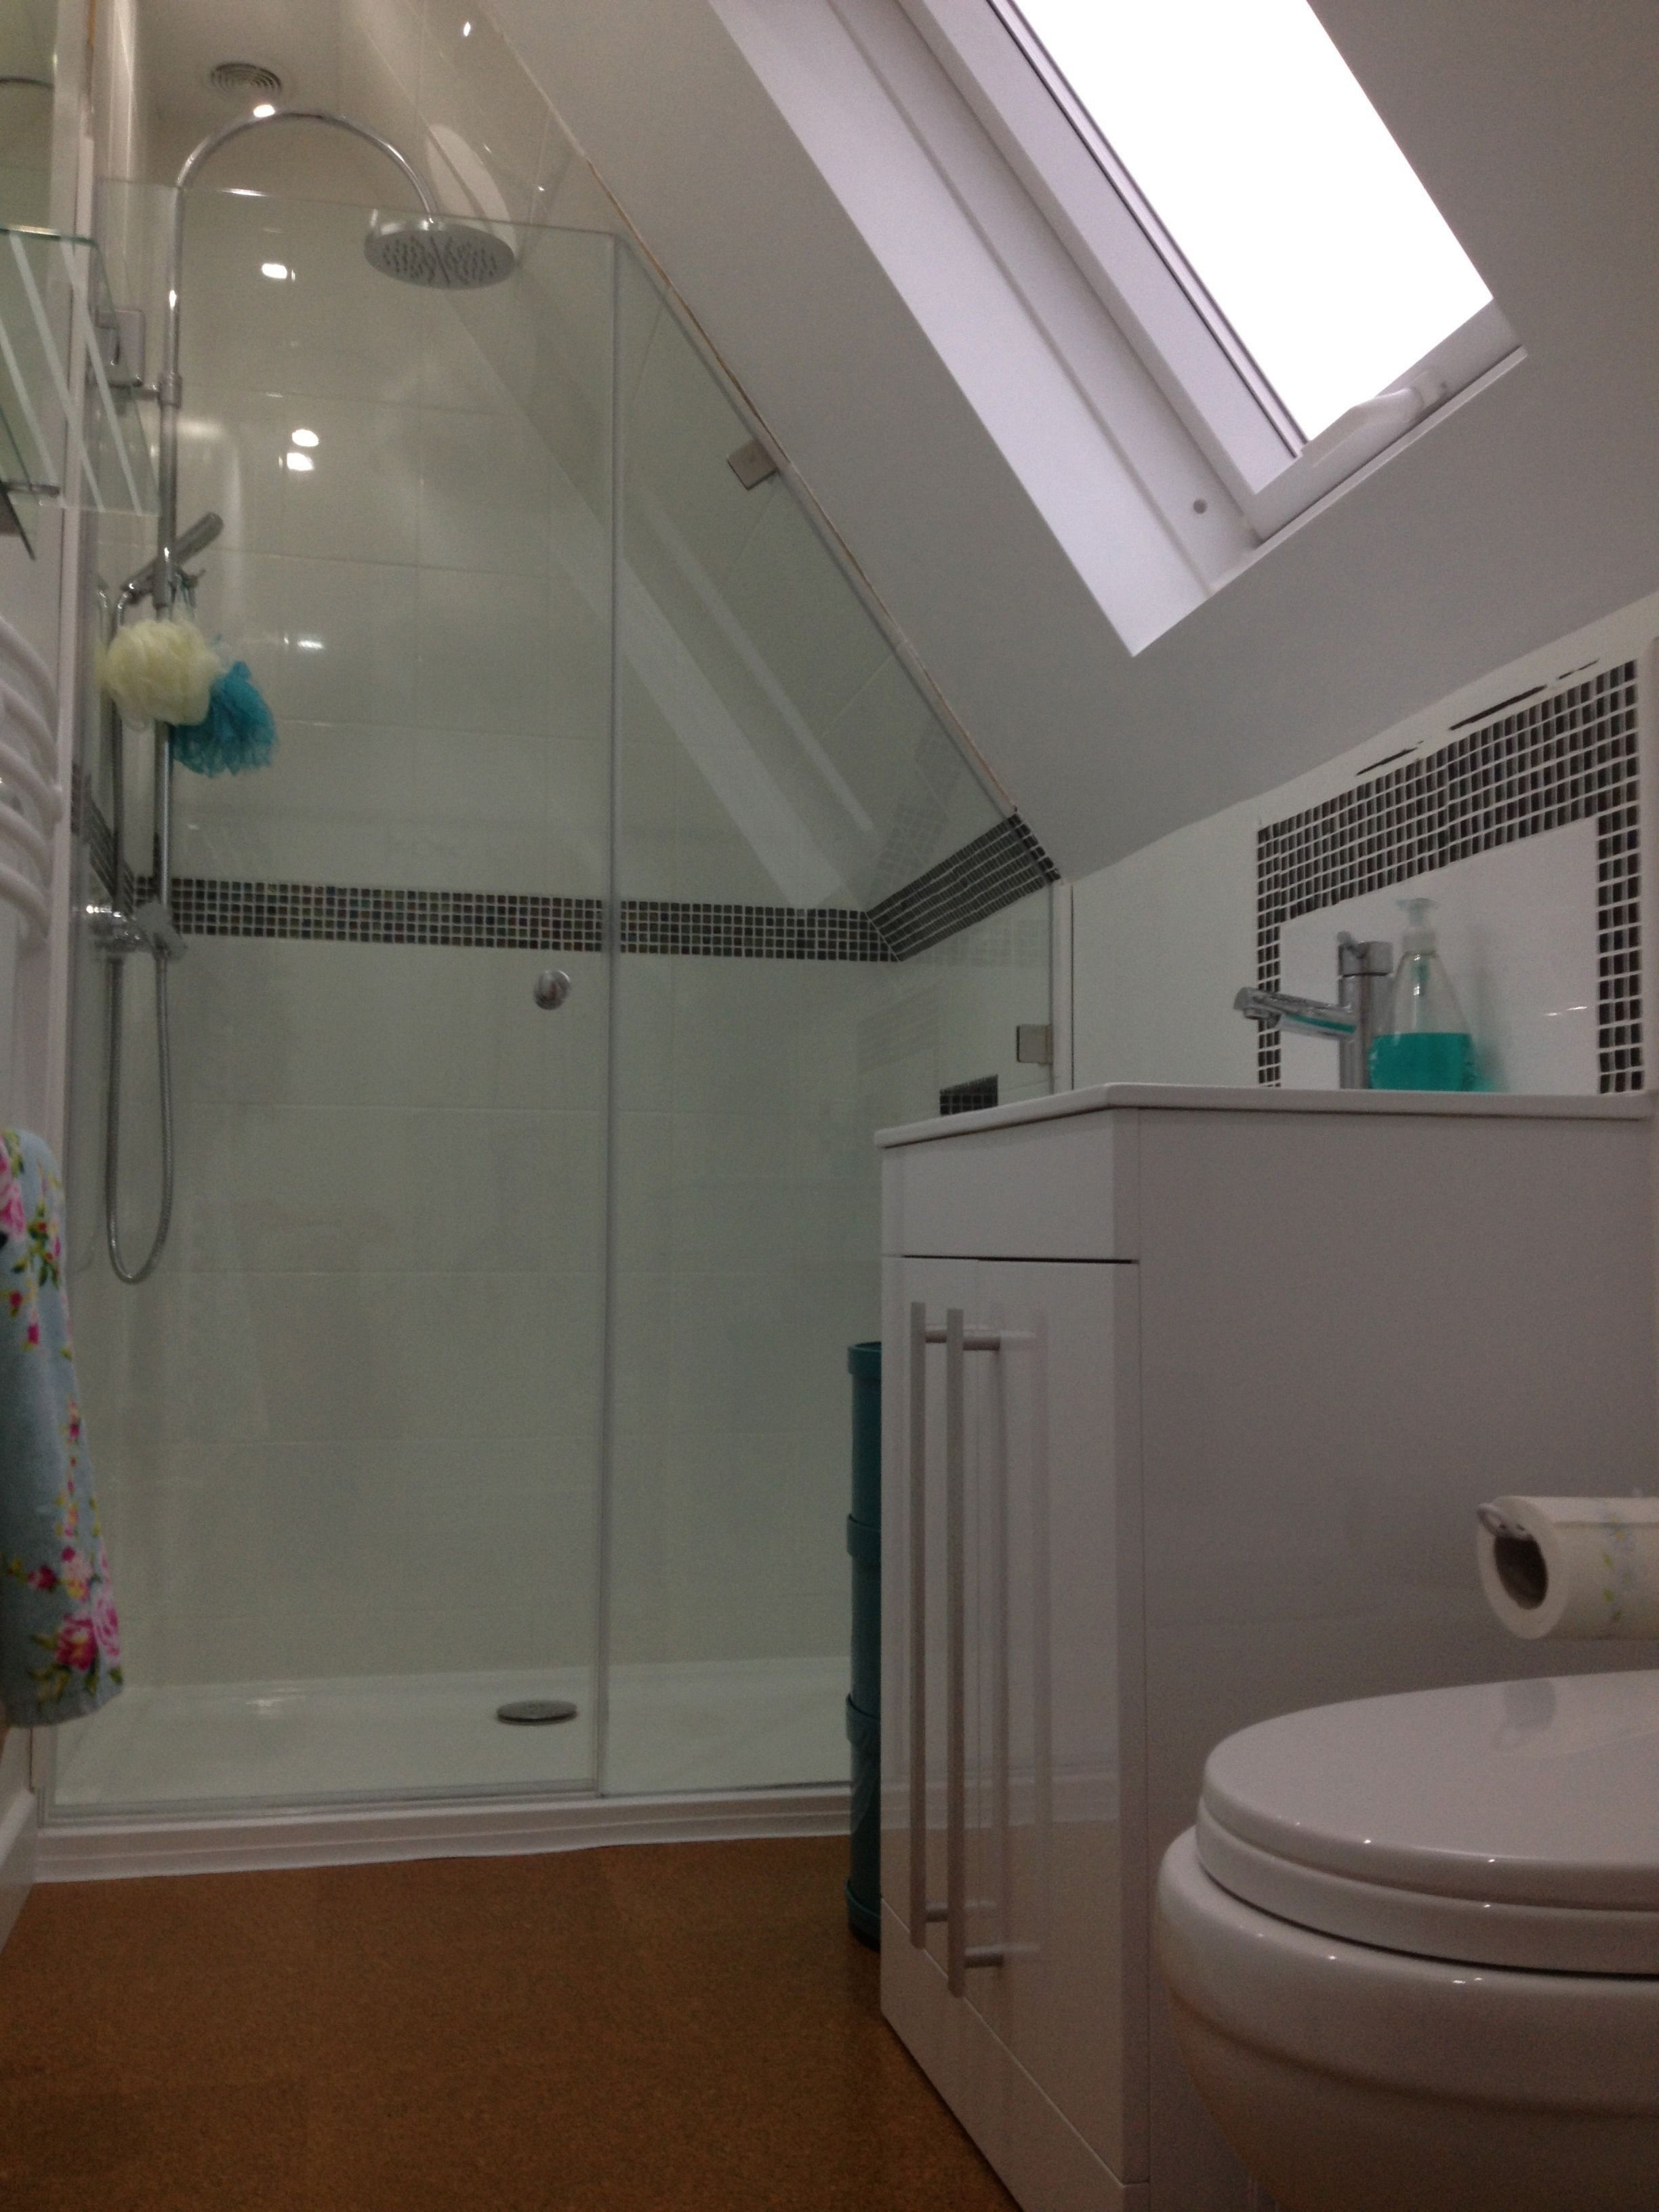 Victoria Plumb The Uk S Leading Online Bathroom Retailer Loft Bathroom New Bathroom Ideas Bathroom